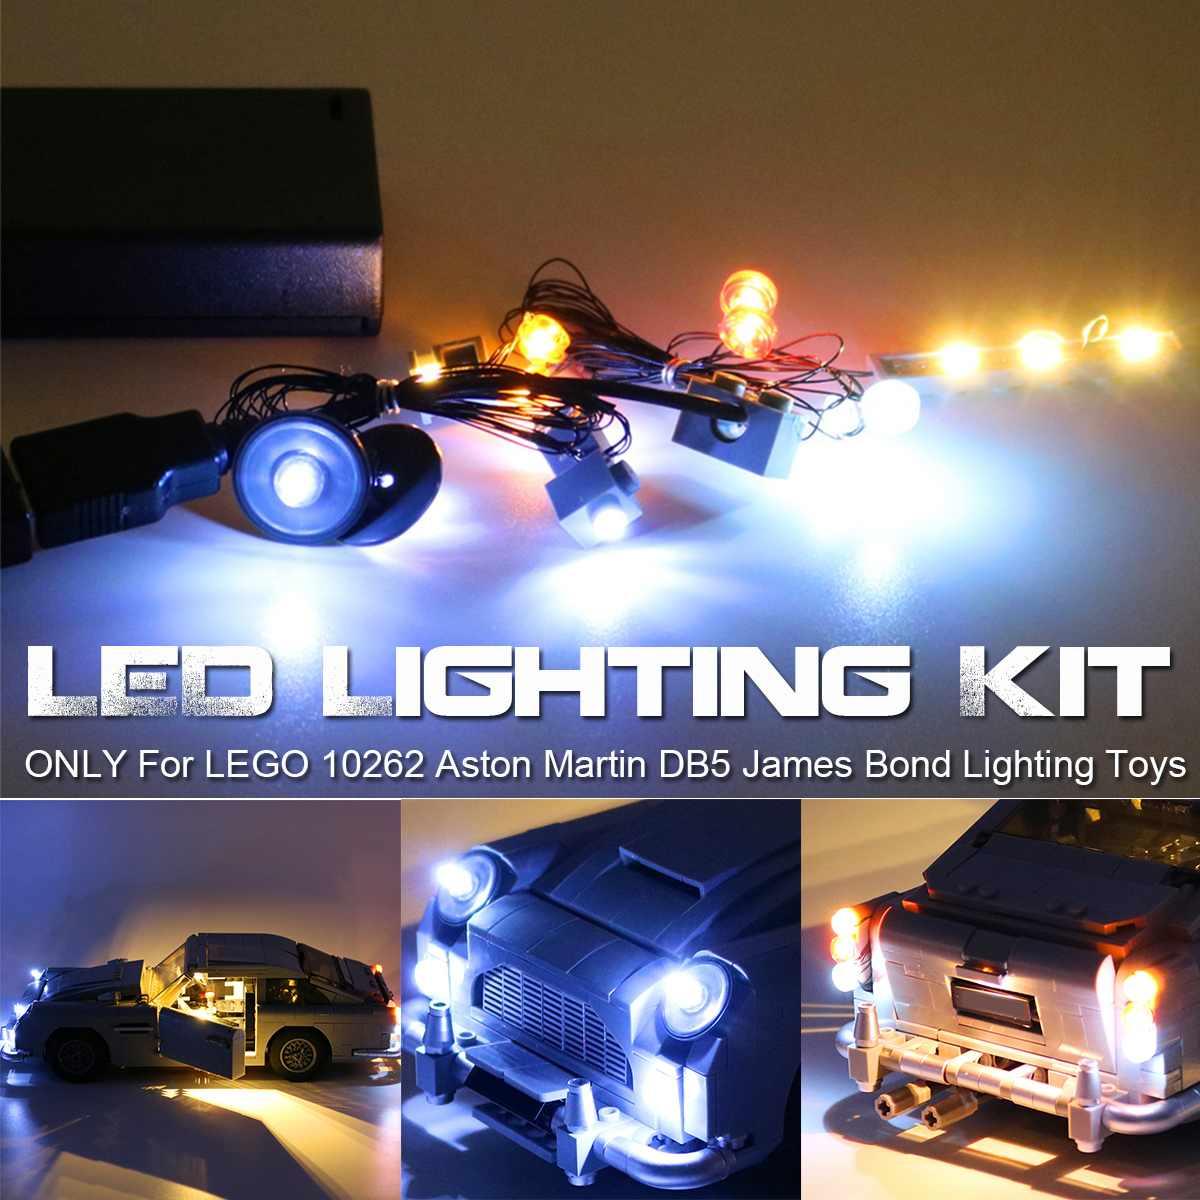 Kit de iluminación de luz LED 10262 Aston DB5 para James para juguetes de ladrillos de iluminación Bond con caja de almacenamiento (modelo no incluido)